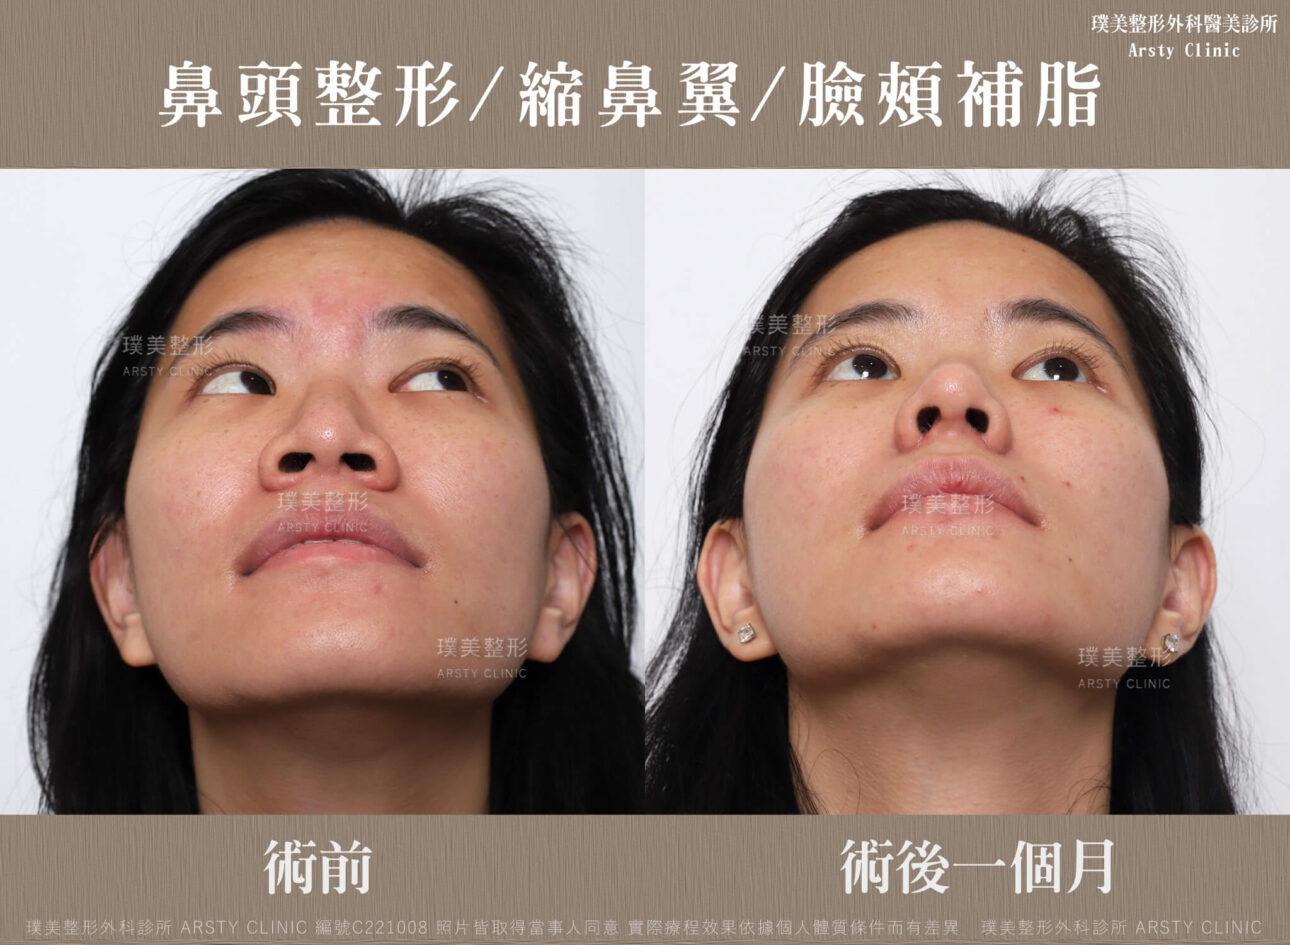 鼻頭整形 縮鼻翼 臉頰補脂 C221008BA1M02